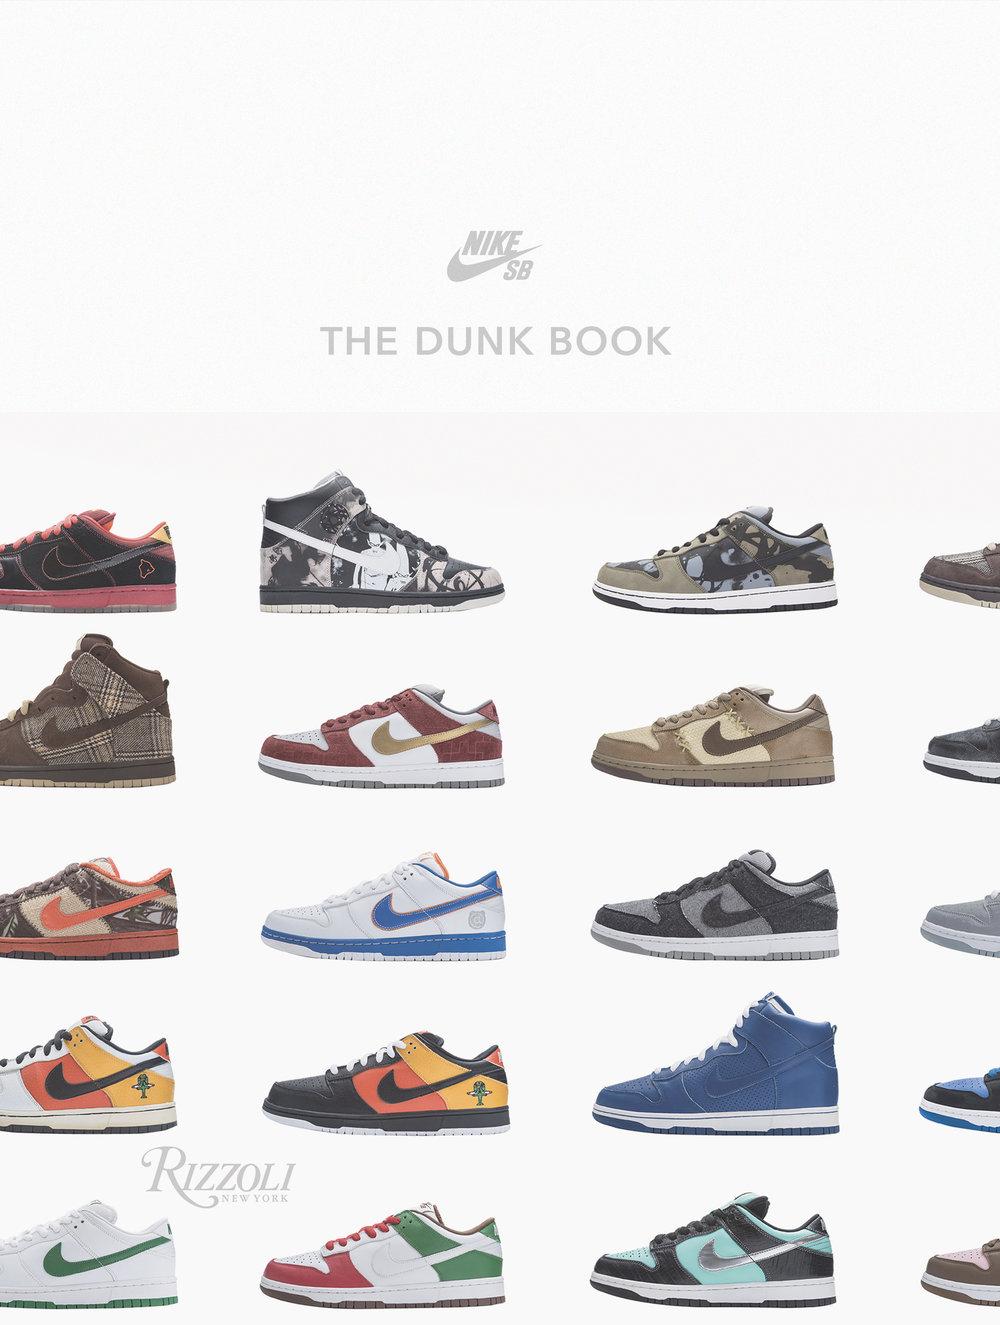 NikeDunk_Cover.jpg